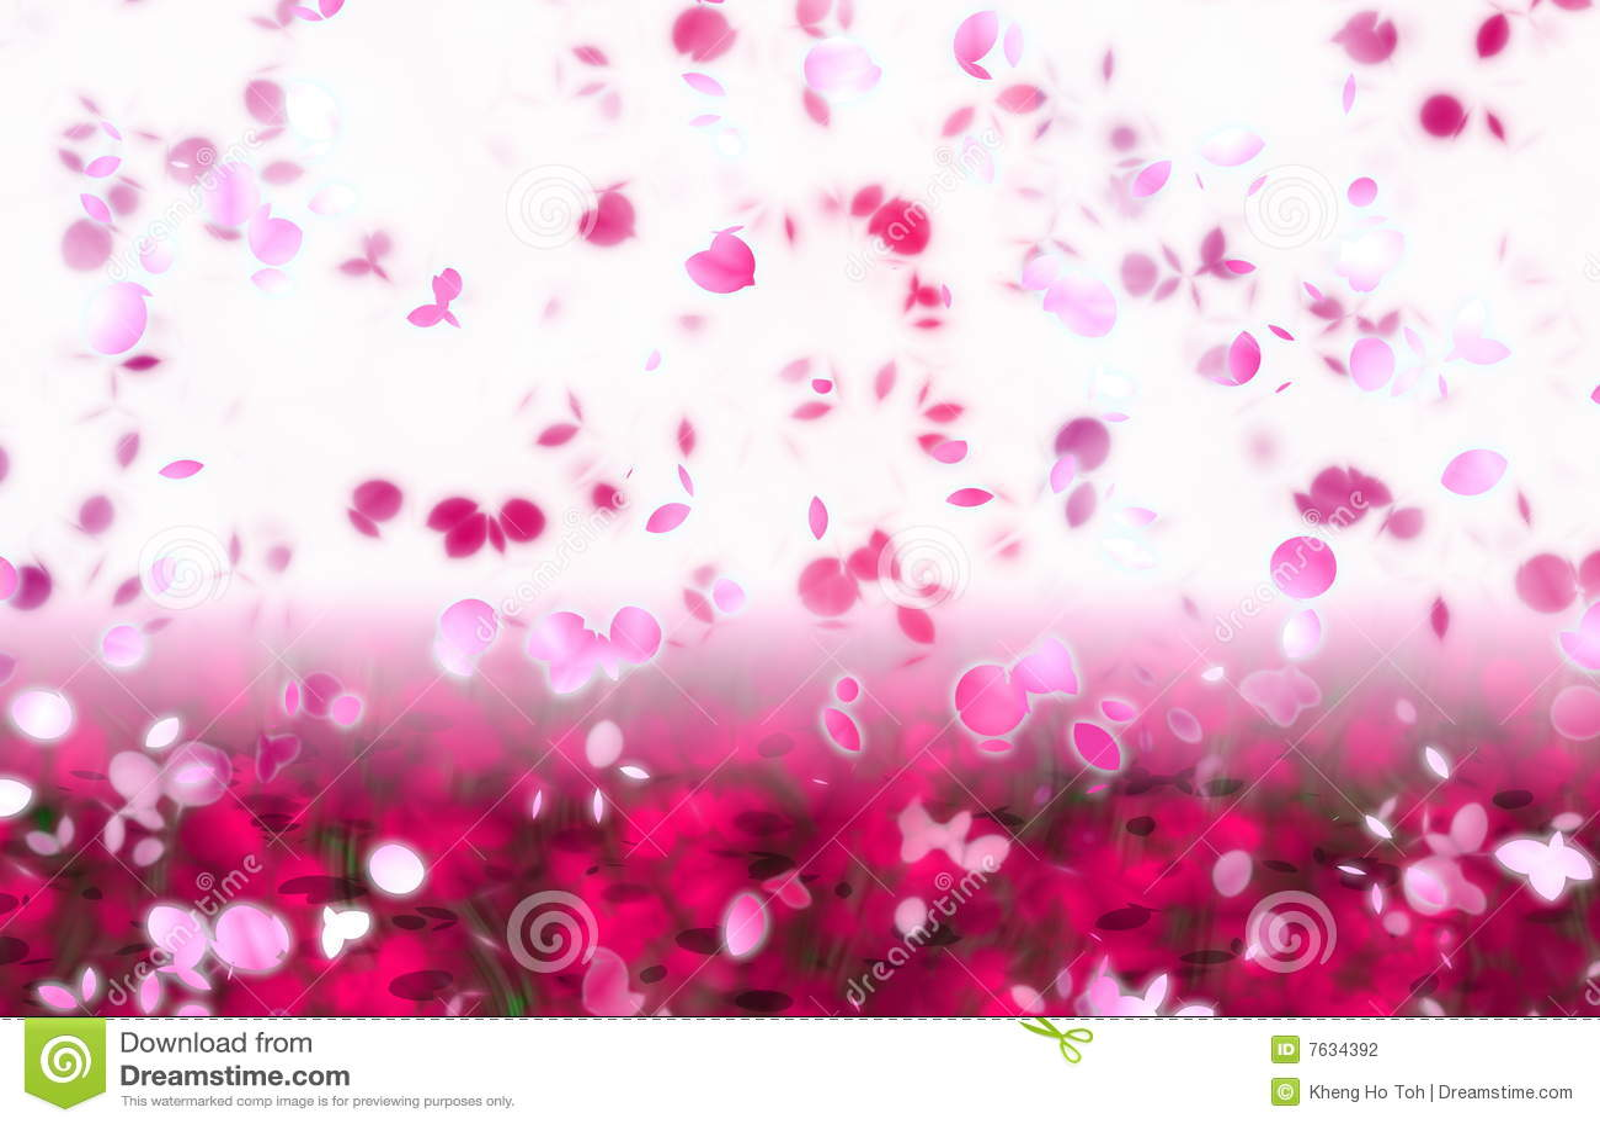 Falling Cherry Blossoms Wallpaper Sakura Snowfall Petals Abstract Background Stock